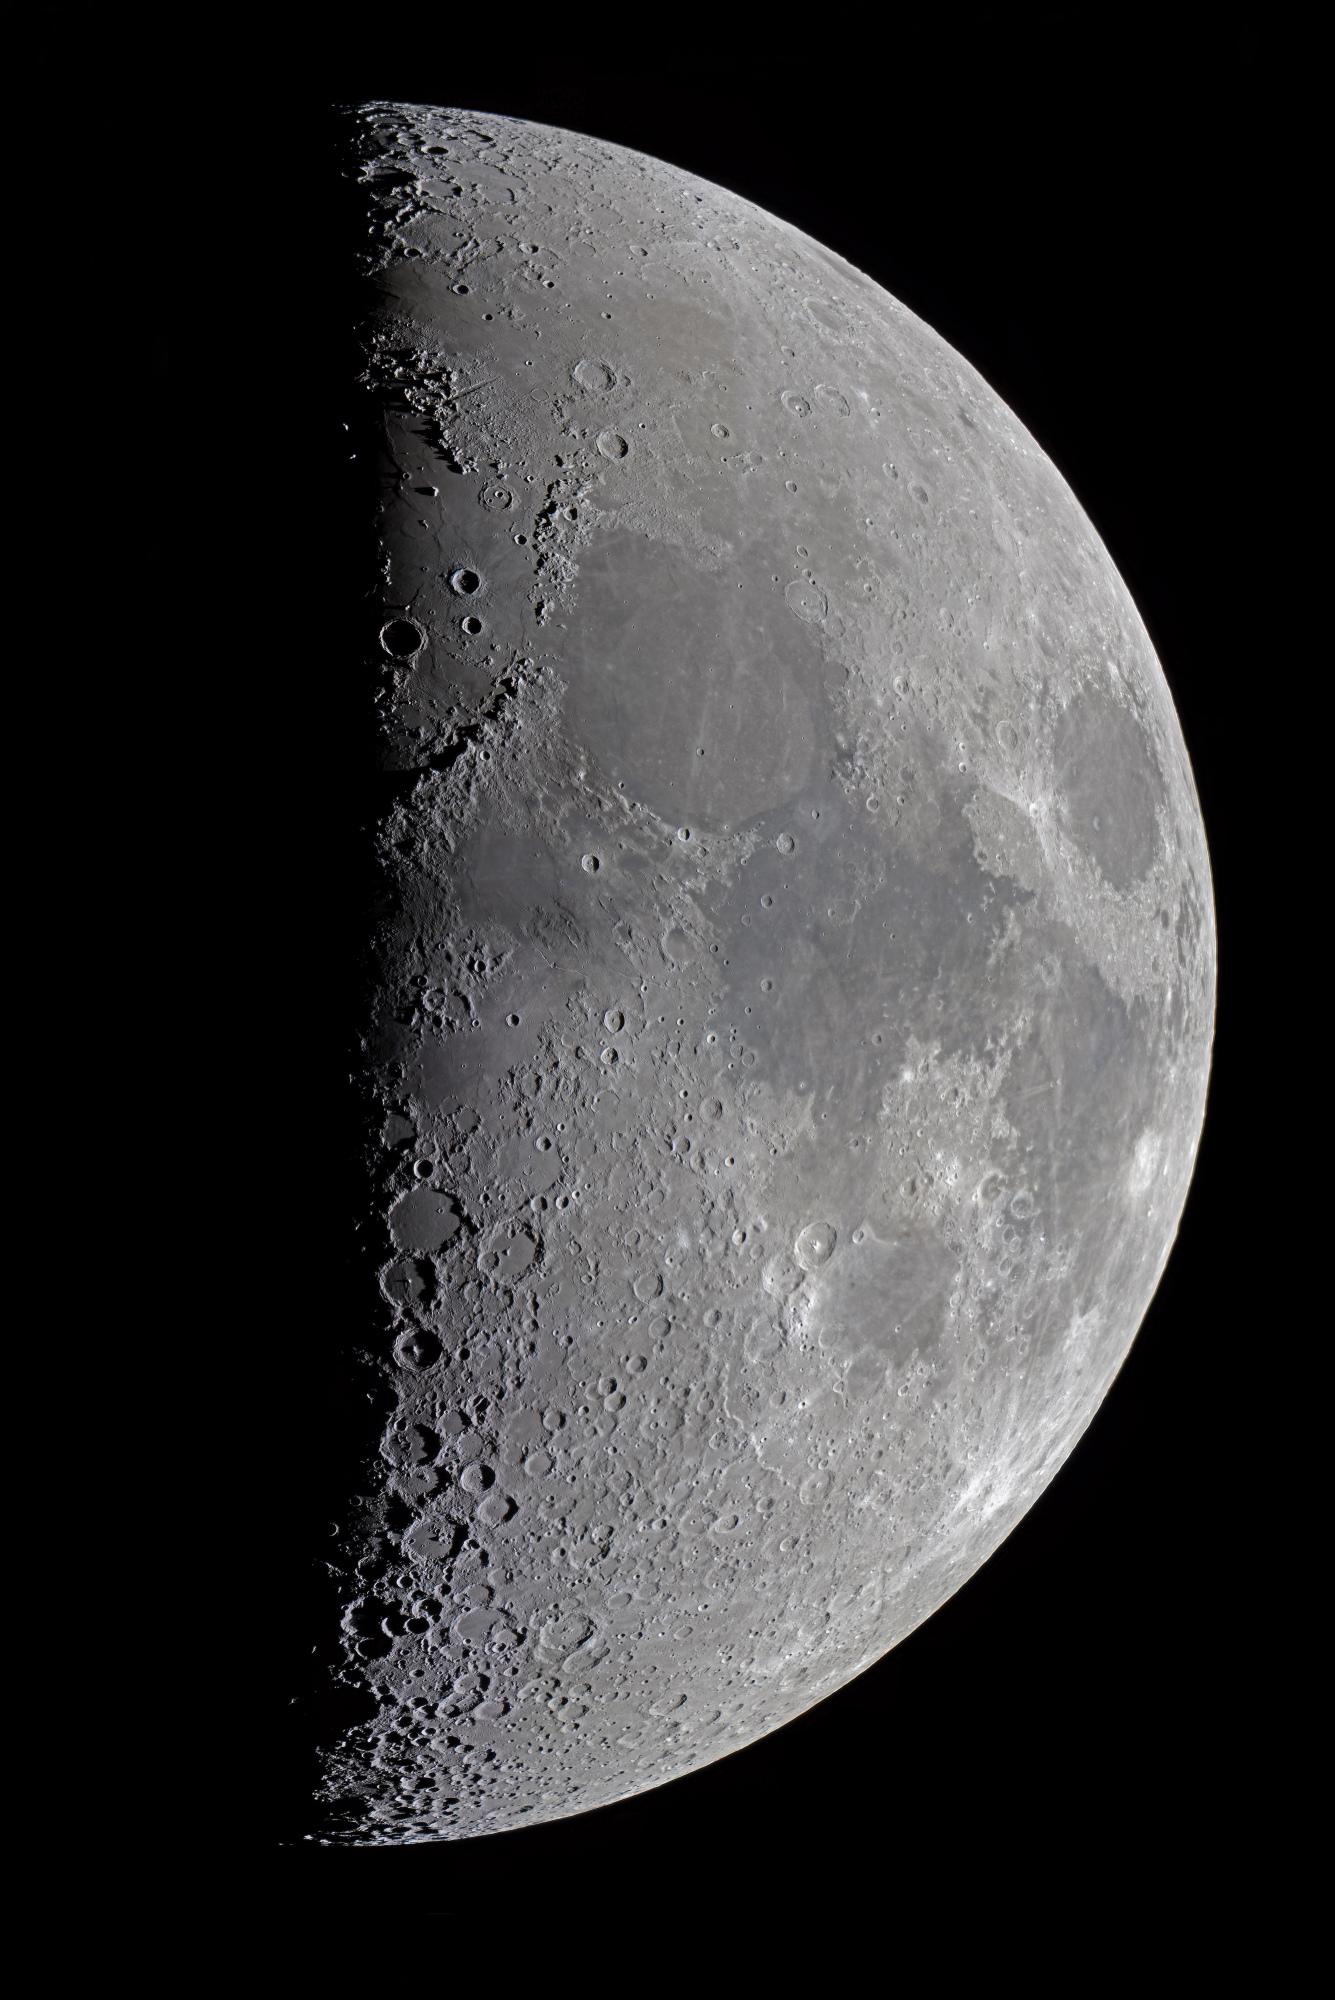 Lune_Telescope_1_M_C2PU_Nikon_D850_ASTROUF.jpg